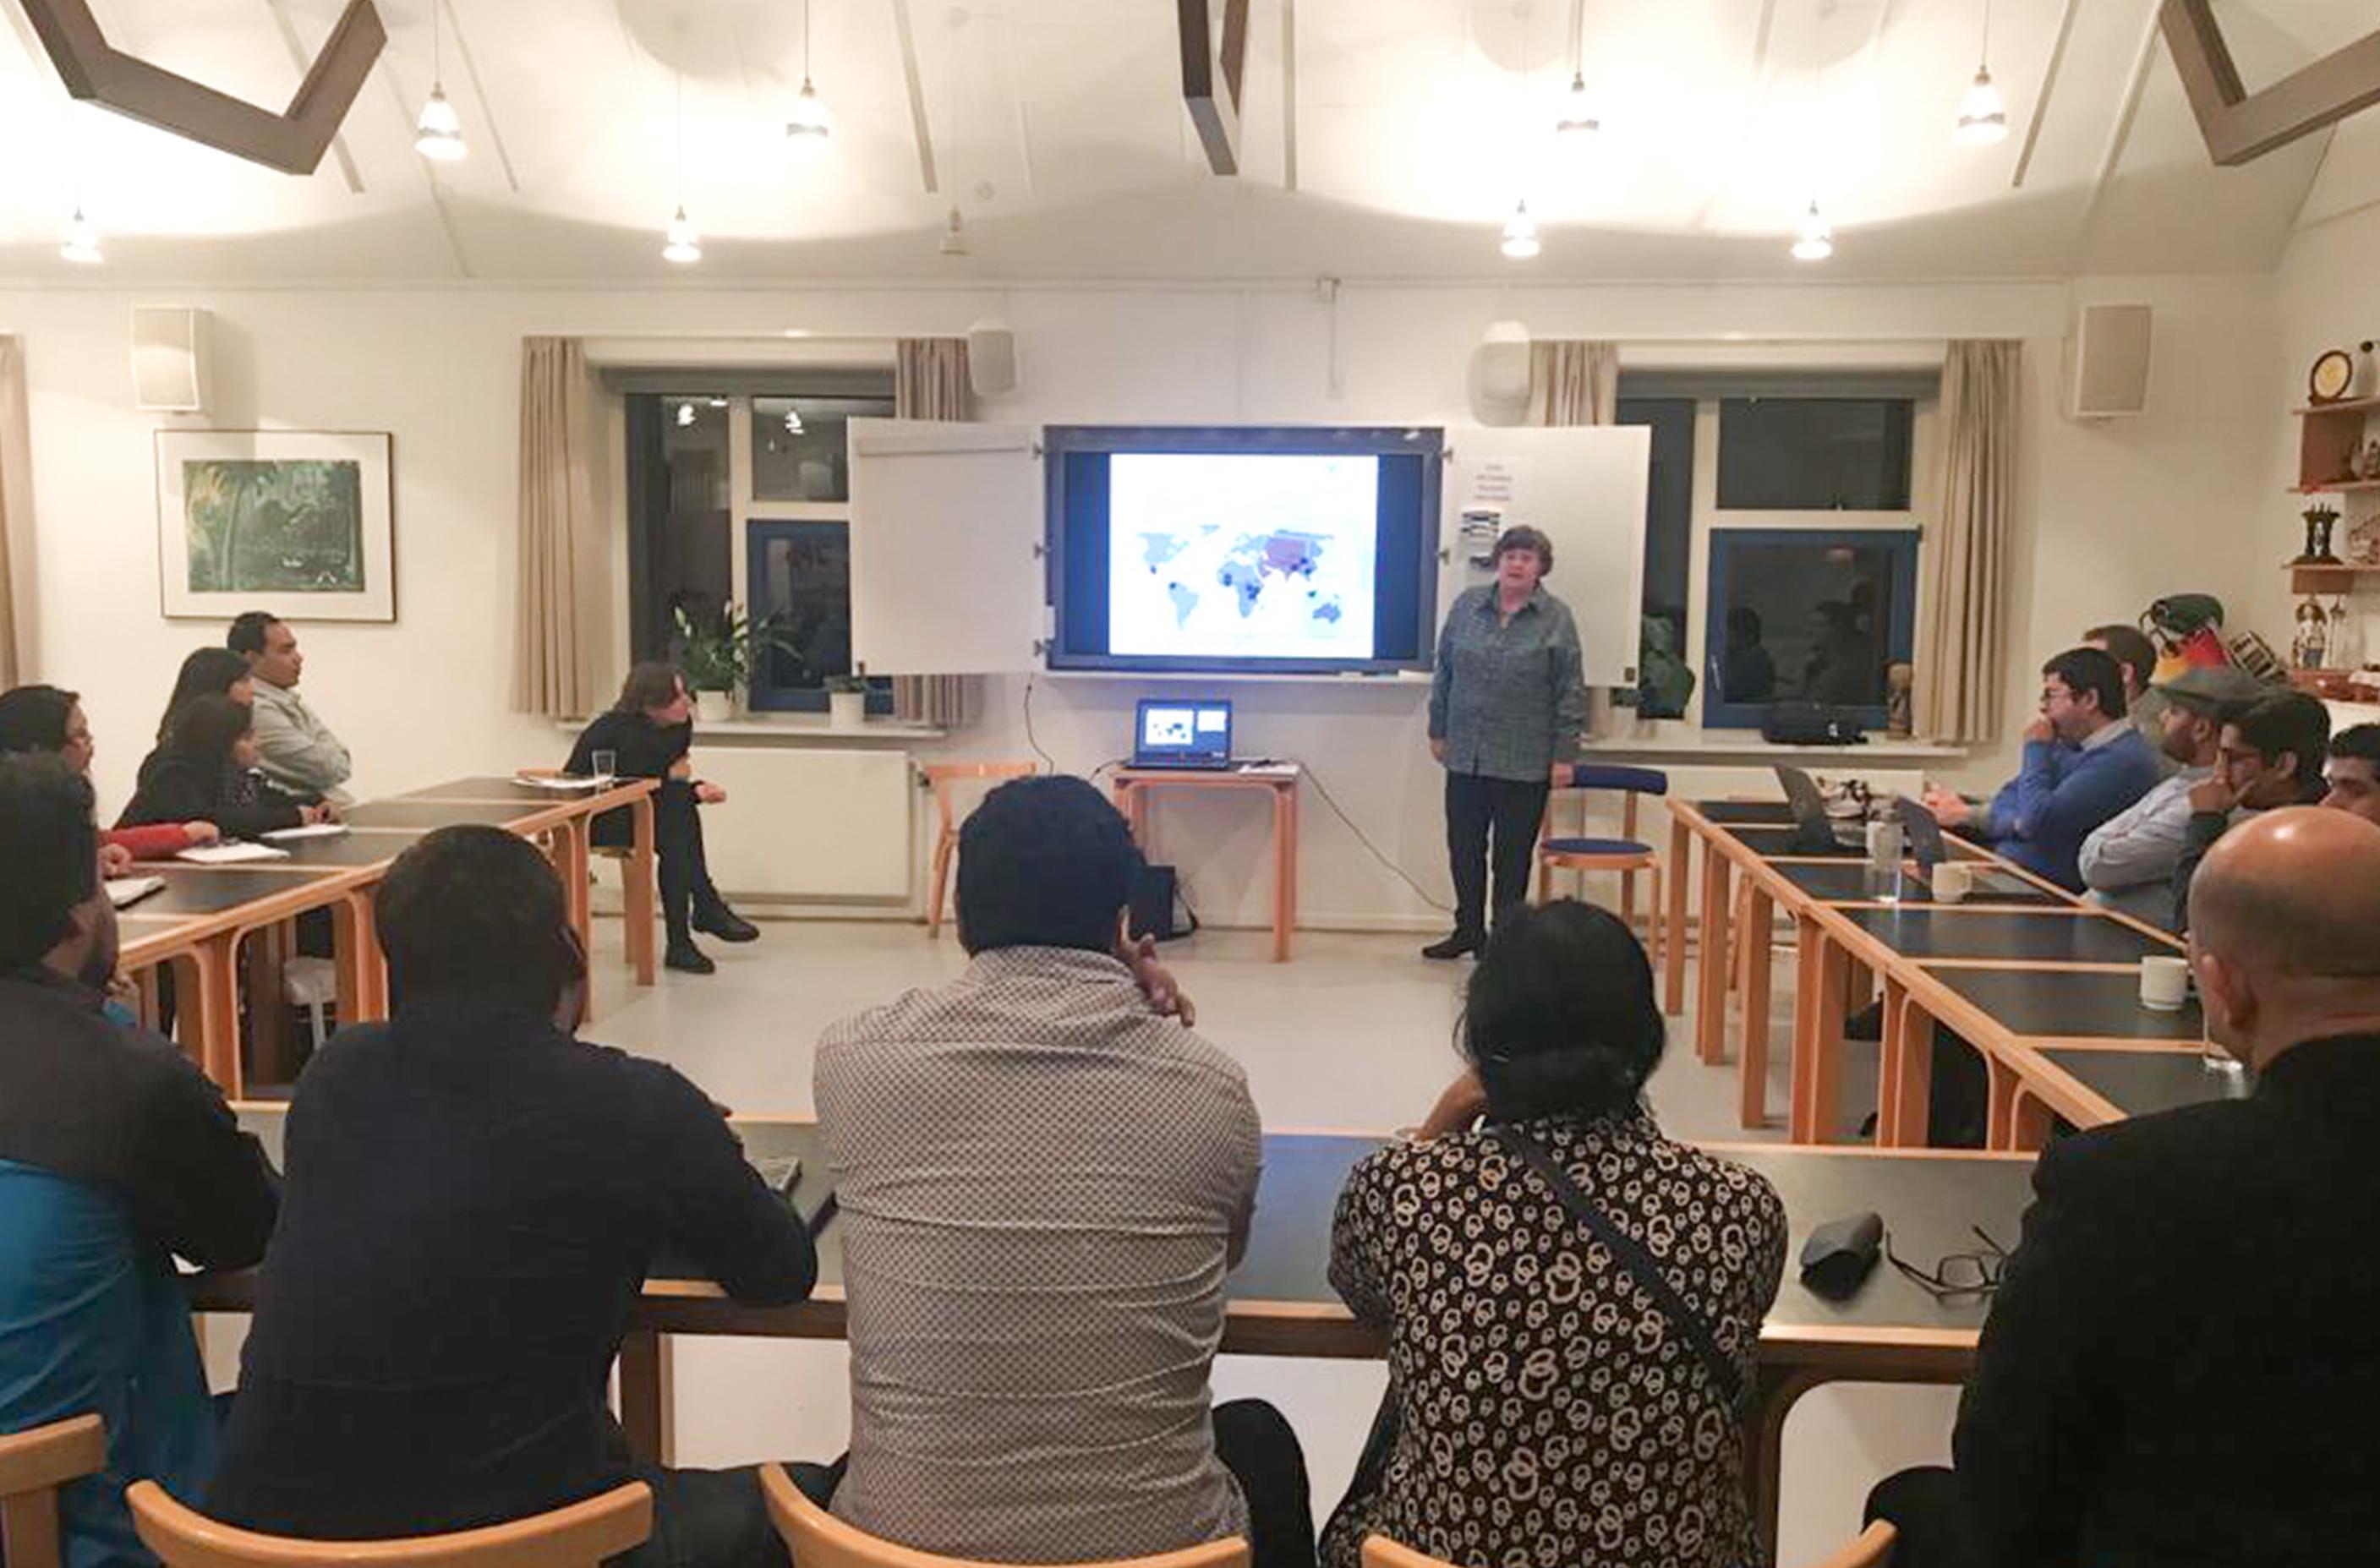 Capacity Advisor, Annette Kaalund-Jørgensen, giving a presentation